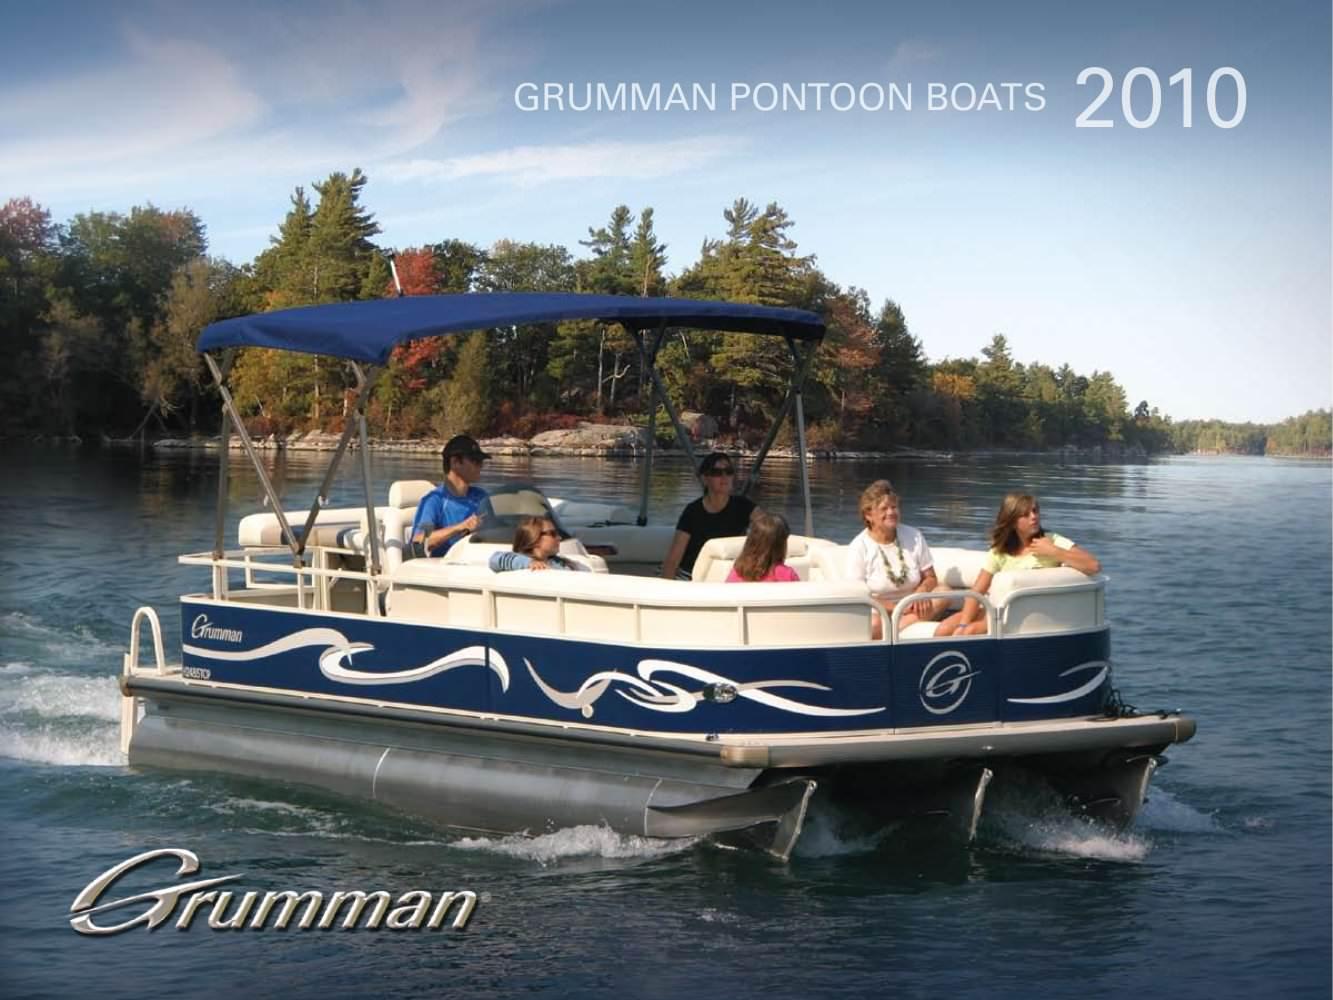 Grumman Pontoon Boats 2010 Marathon Pdf Catalogs Documentation